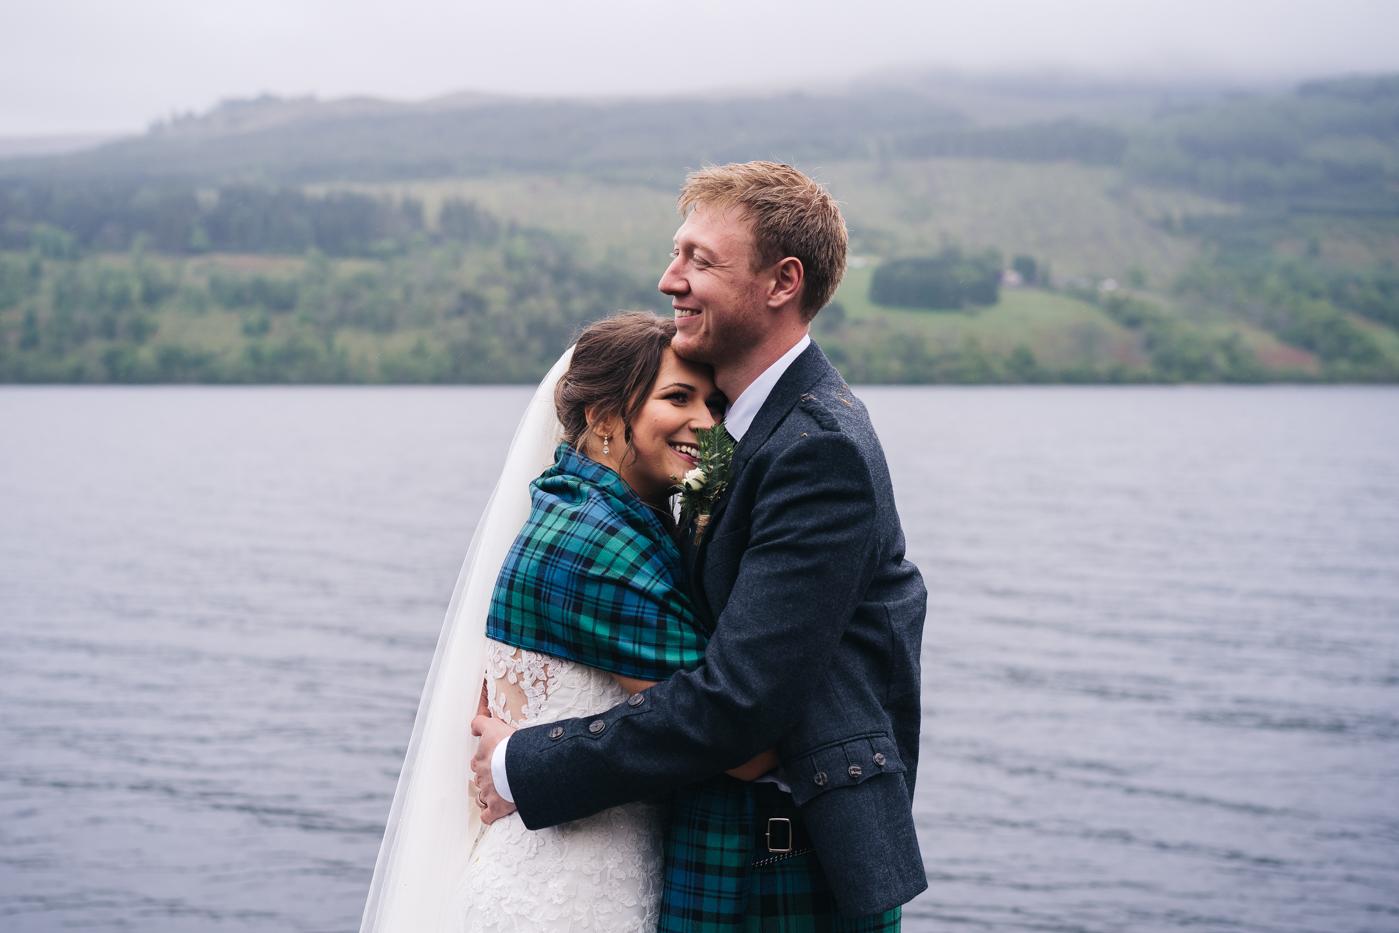 scottish-wedding-trossachs-loch-tay-highlannds-relaxed-photography-photographer-0037.jpg